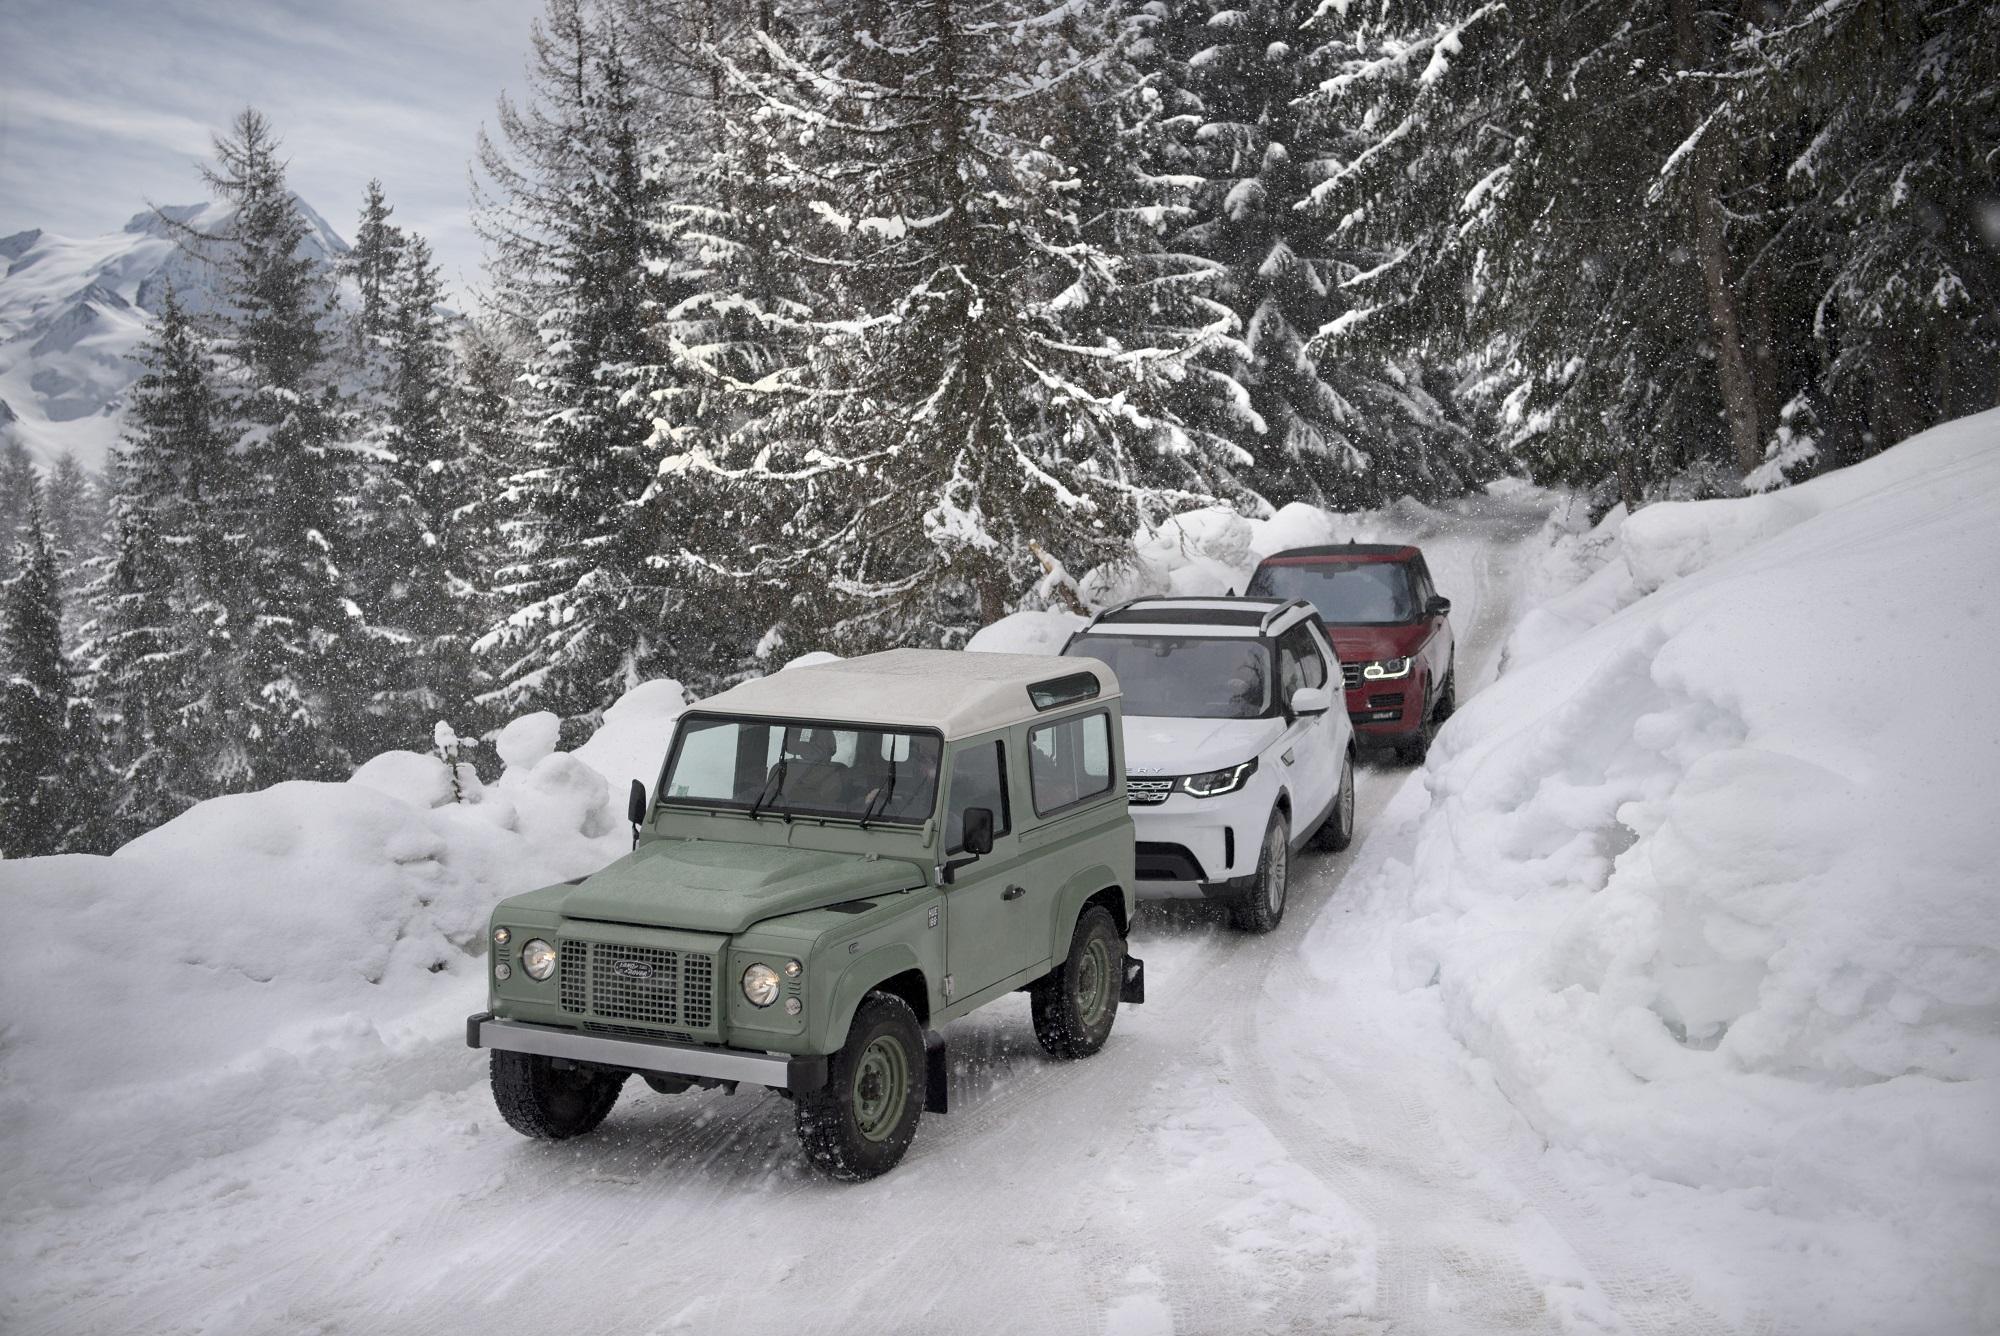 Jaguarforums.com Land Rover Defender 70th Anniversary Celebration